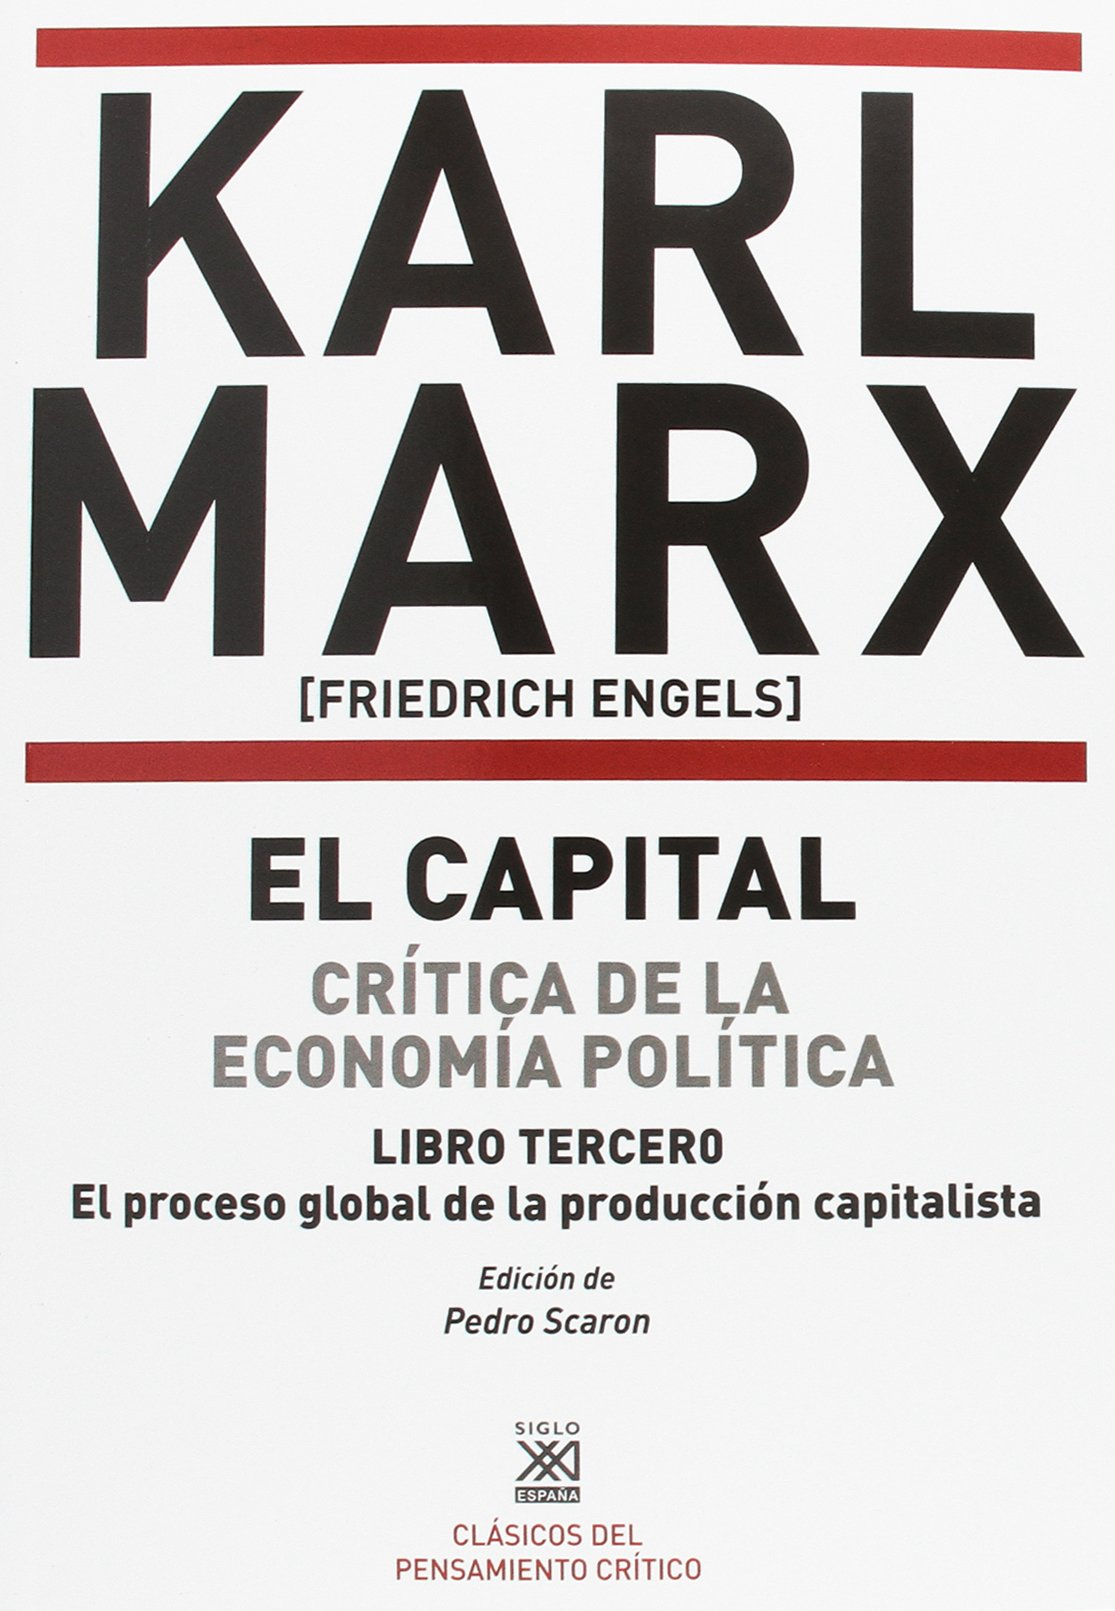 EL CAPITAL. OBRA COMPLETA: Amazon.es: Karl Marx: Libros